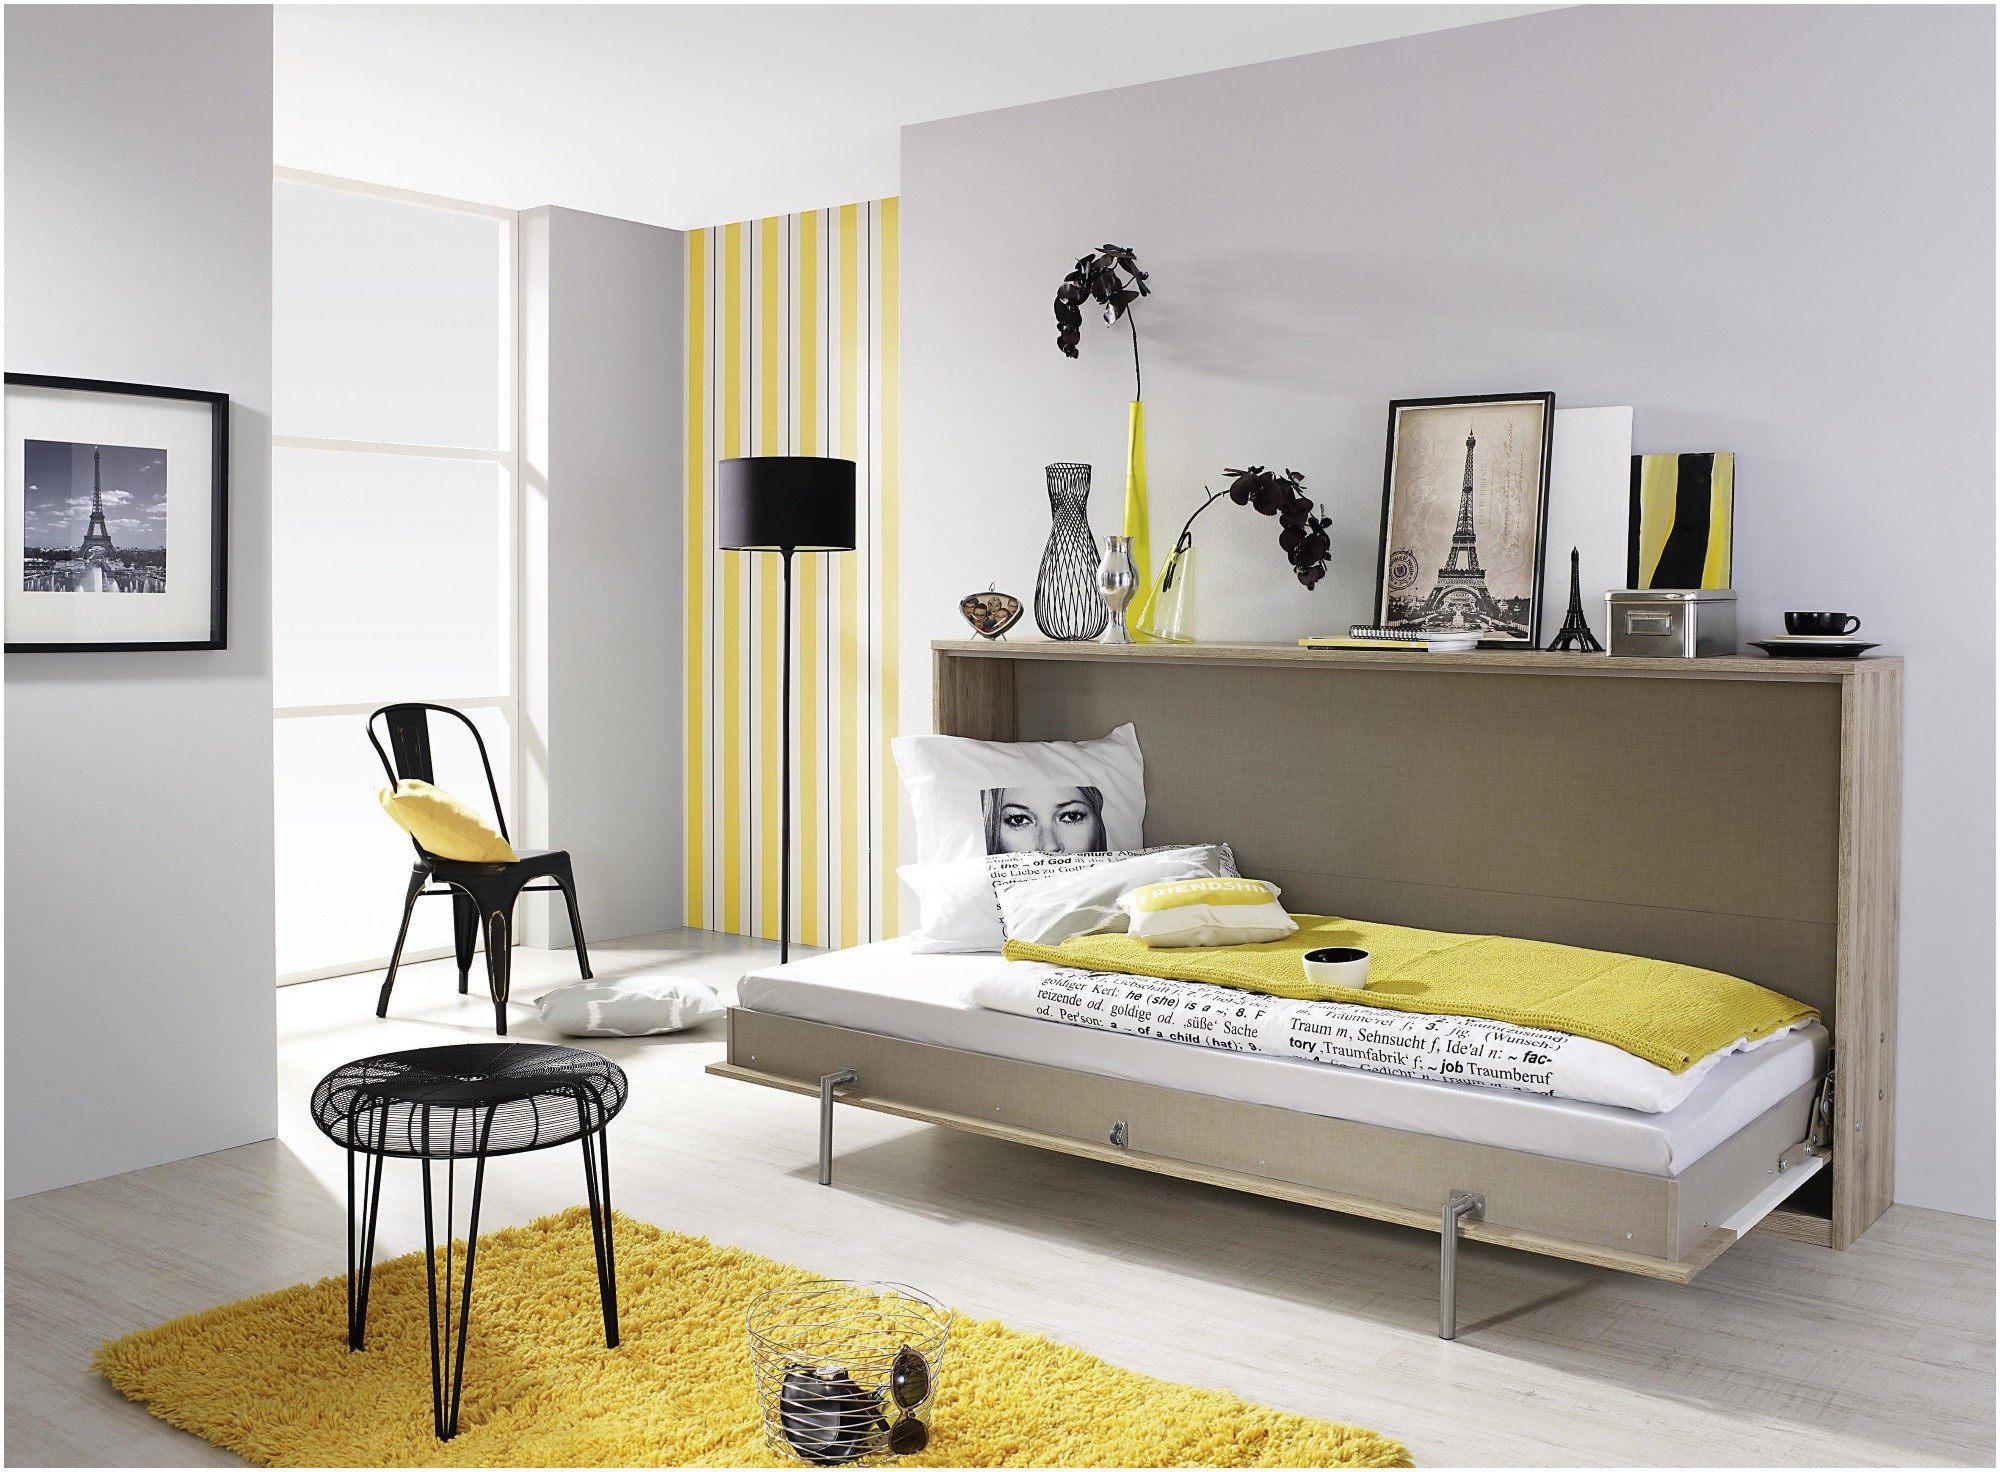 Ikea Malm Tete De Lit Le Luxe Impressionnant Armoir Lit Ikea Chambre Adulte Ikea Génial Ikea